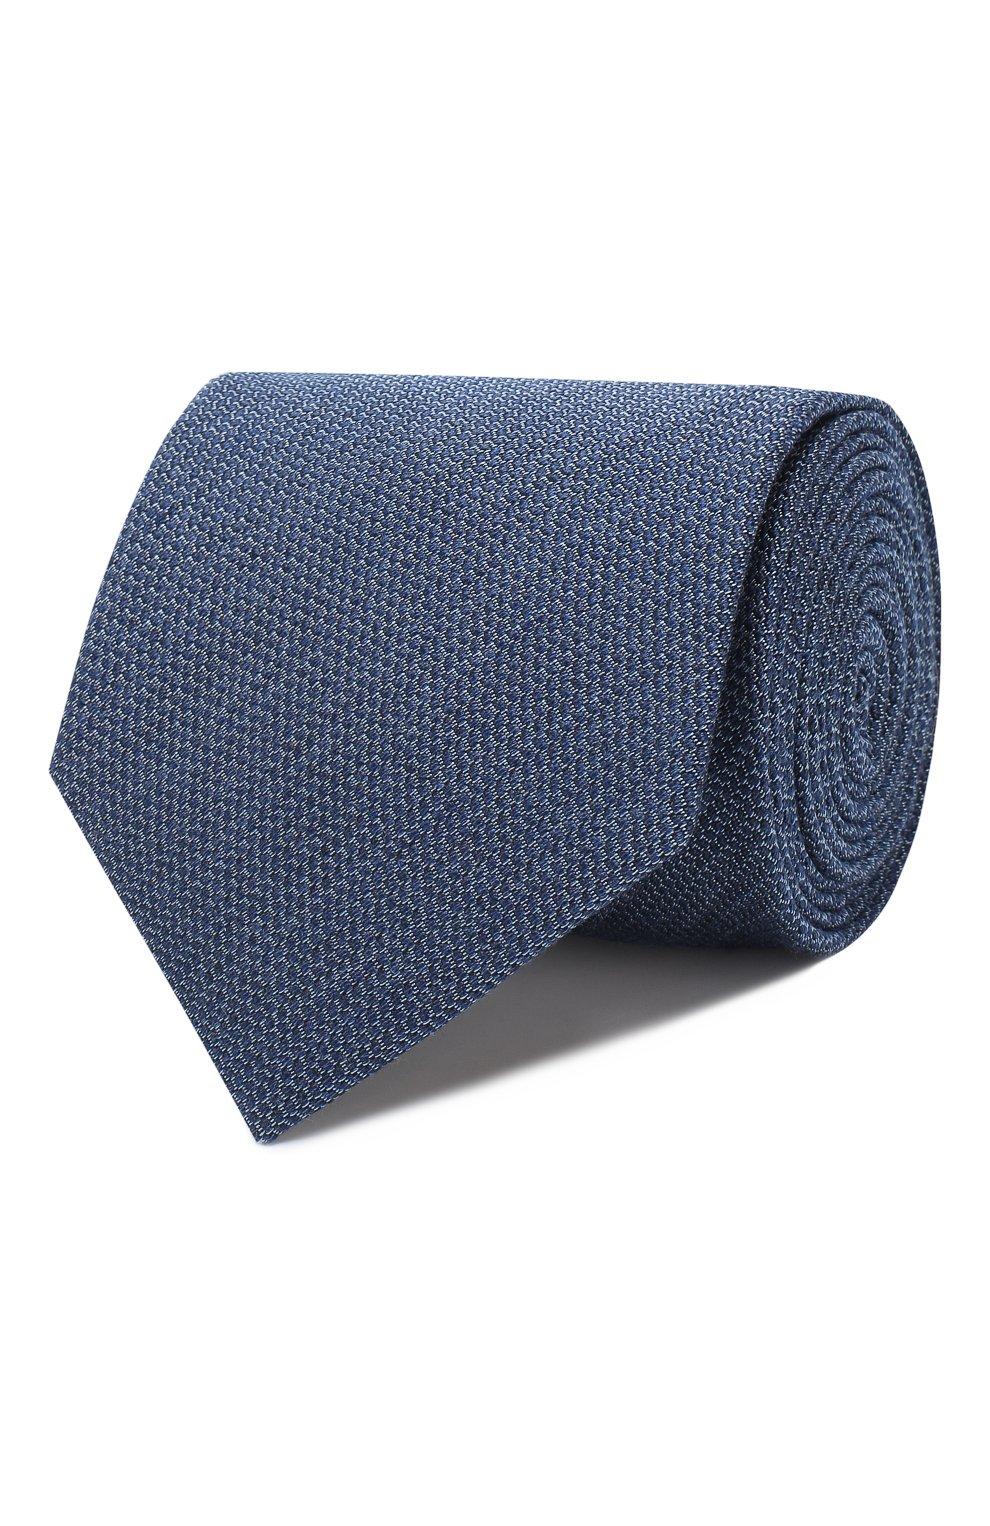 Мужской галстук из смеси шелка и шерсти BRIONI синего цвета, арт. 062I00/08438   Фото 1